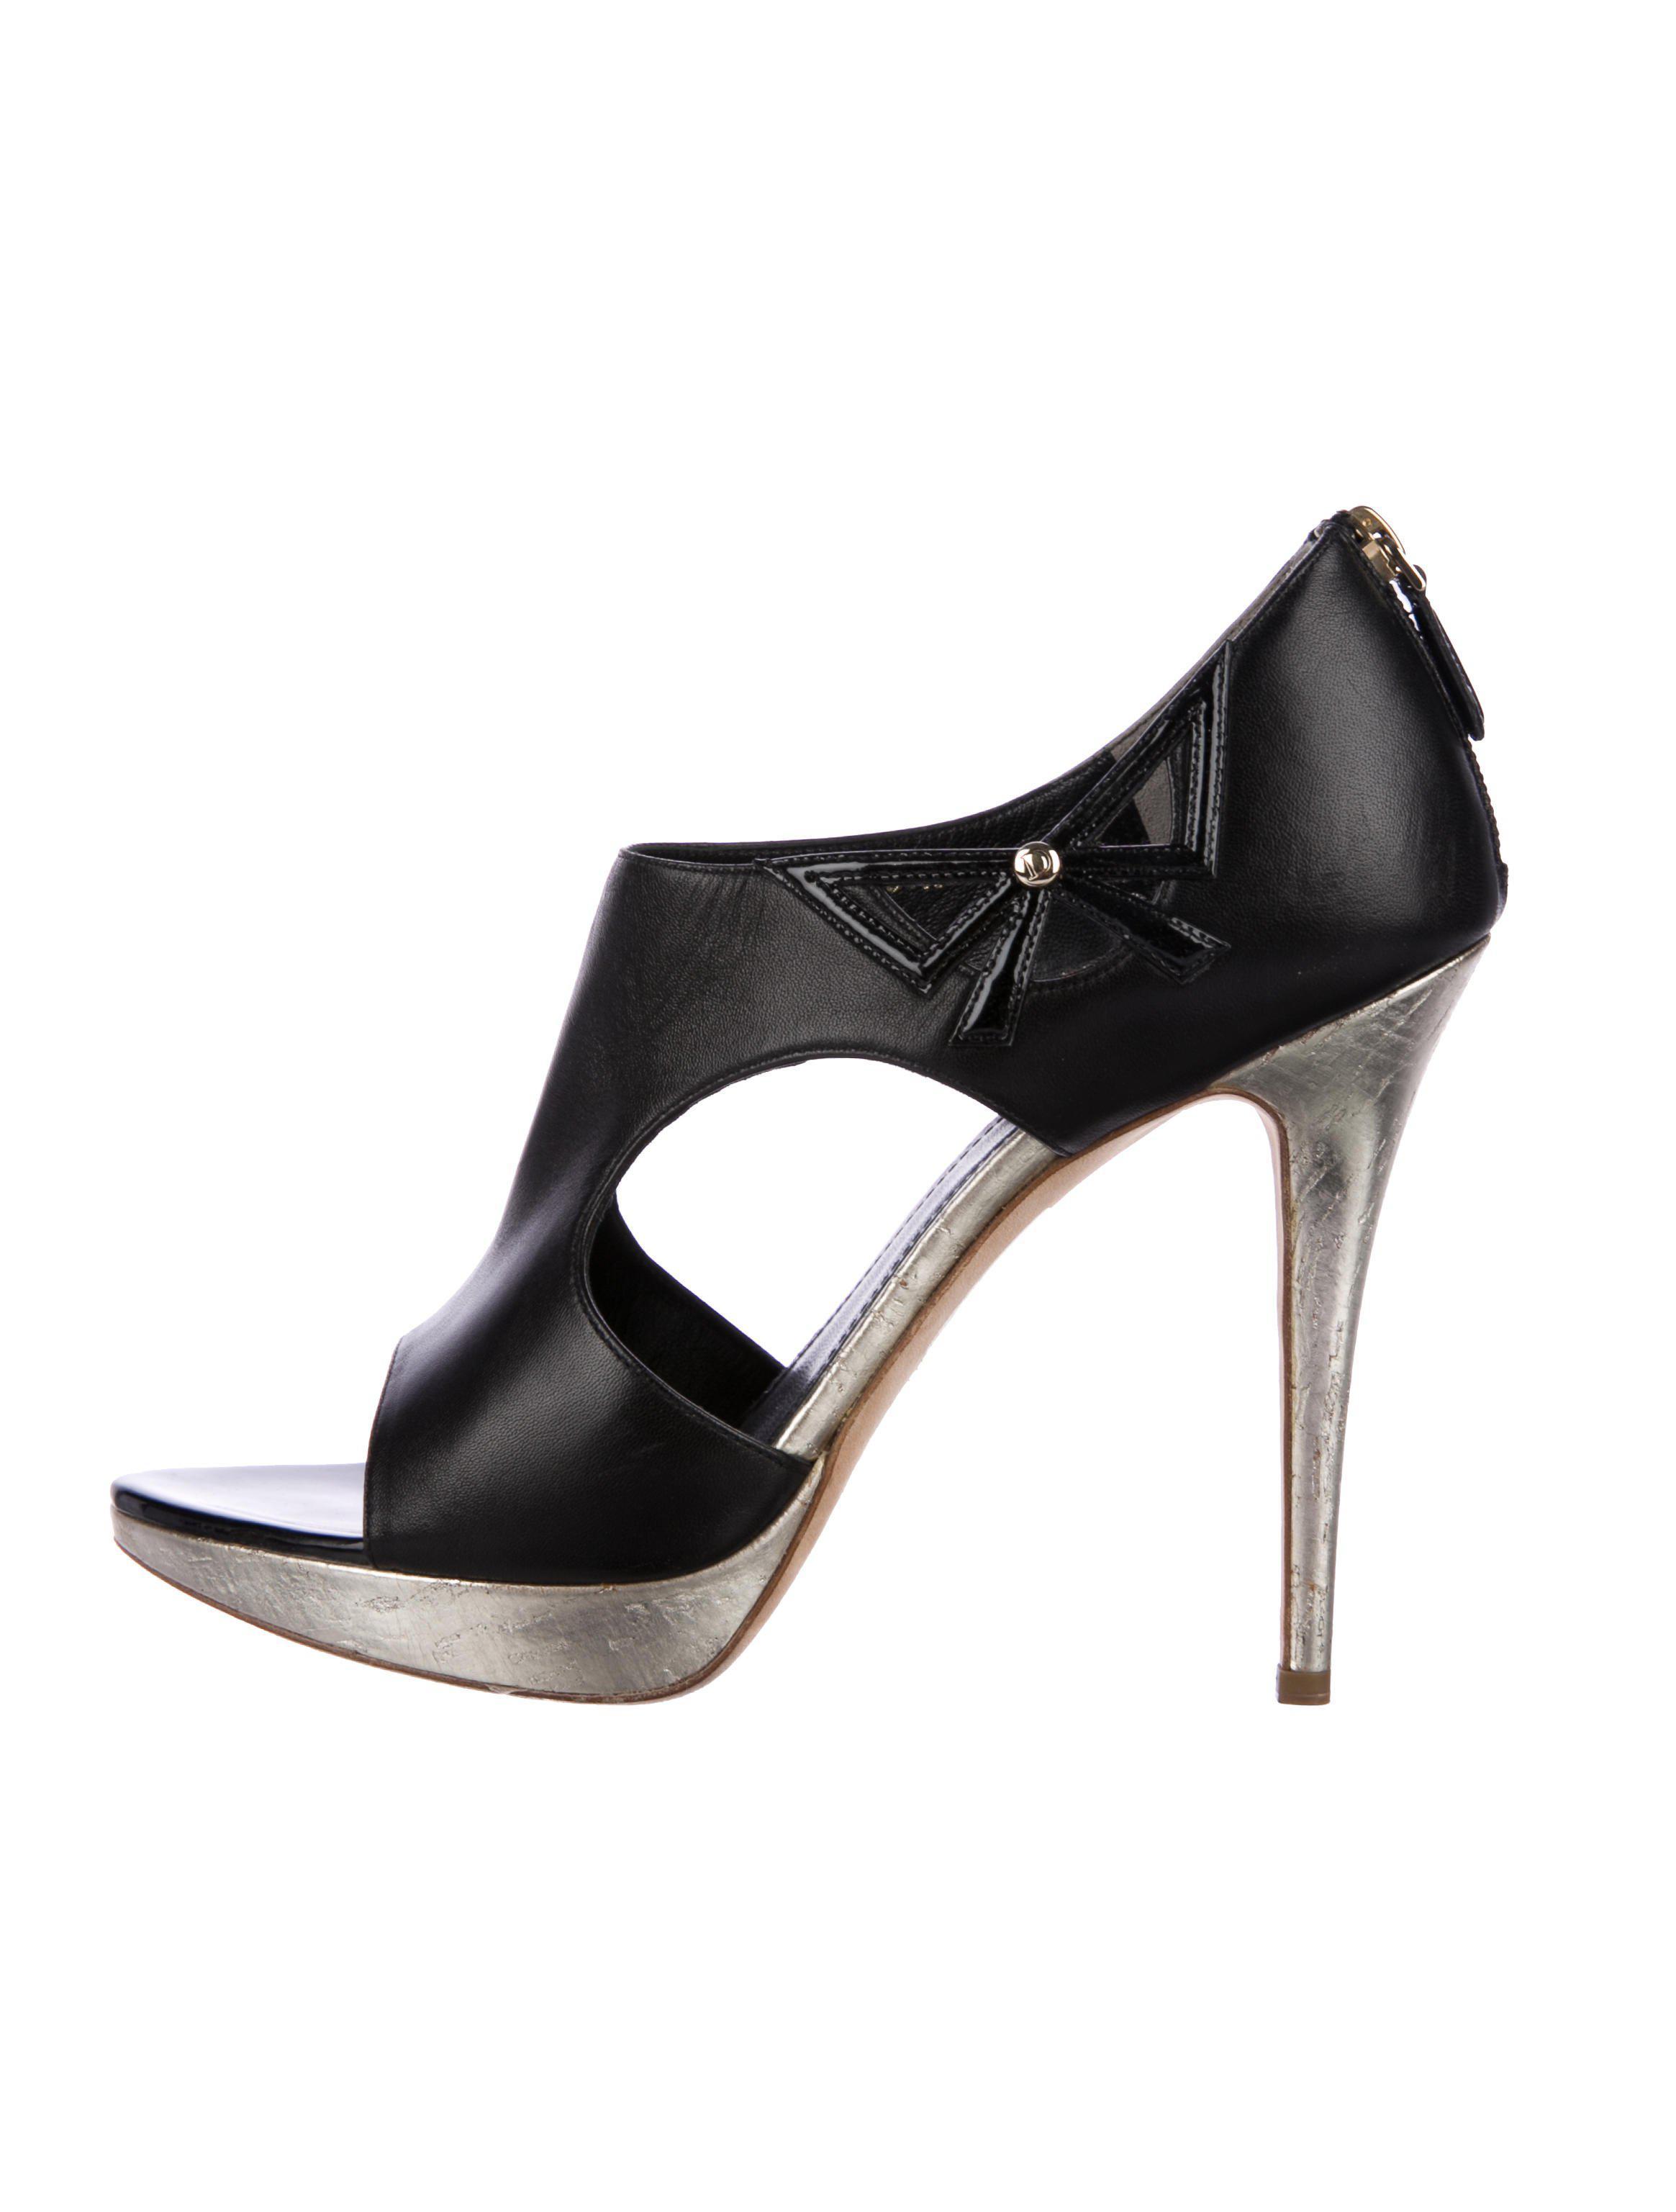 7562a53397 Lyst - Dior Peep-toe Platform Pumps Black in Metallic